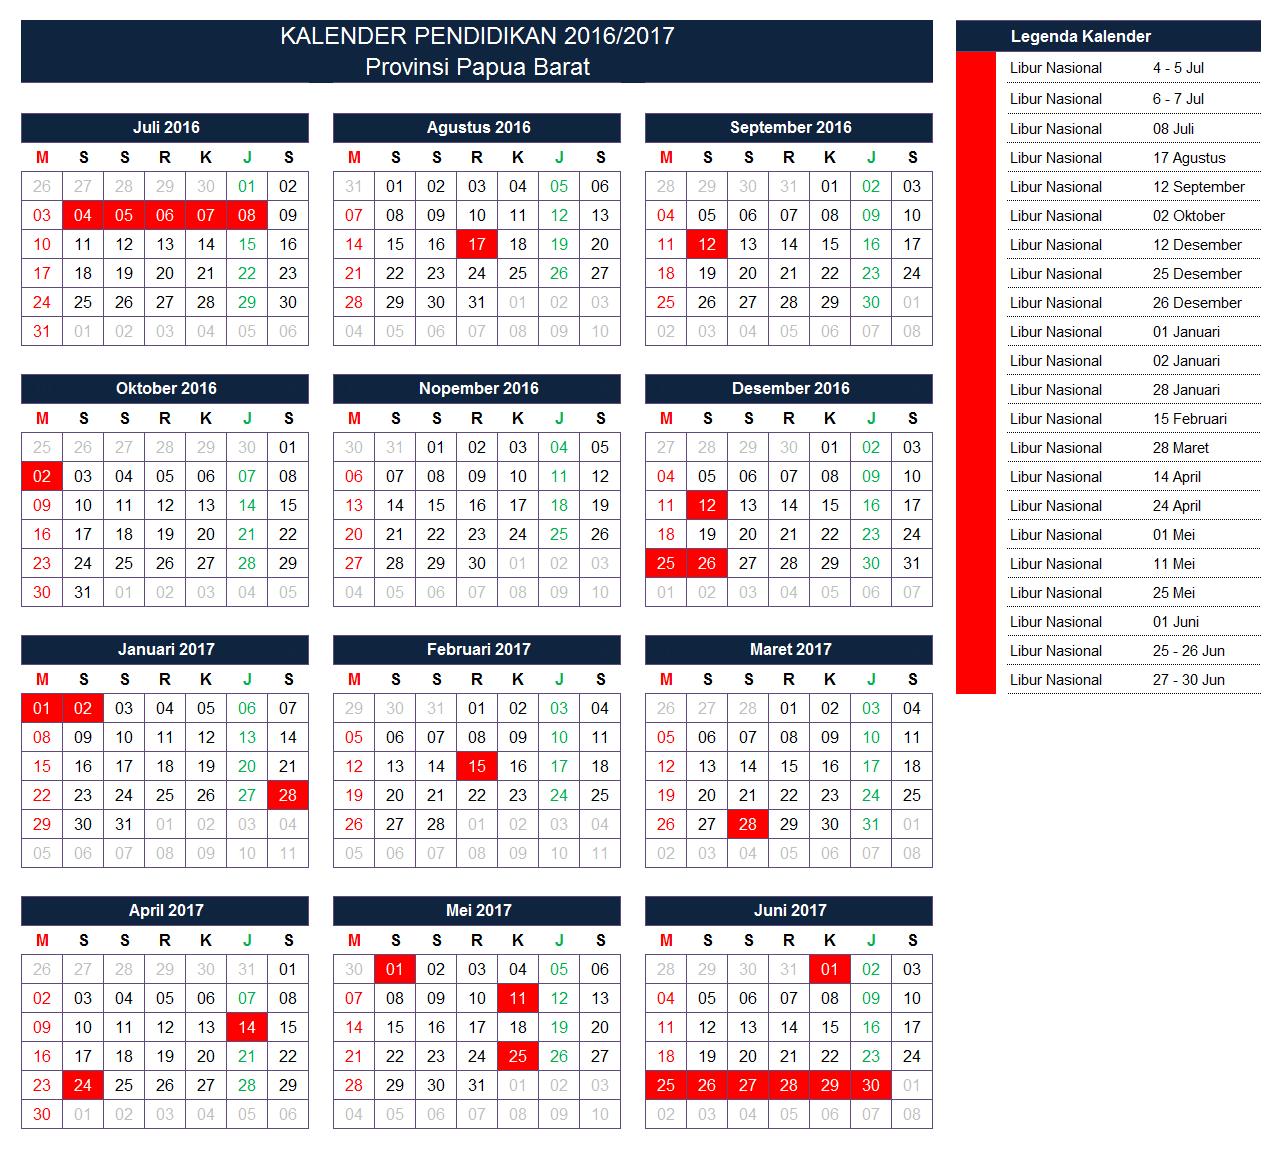 Kalender Pendidikan Provinsi Papua Barat